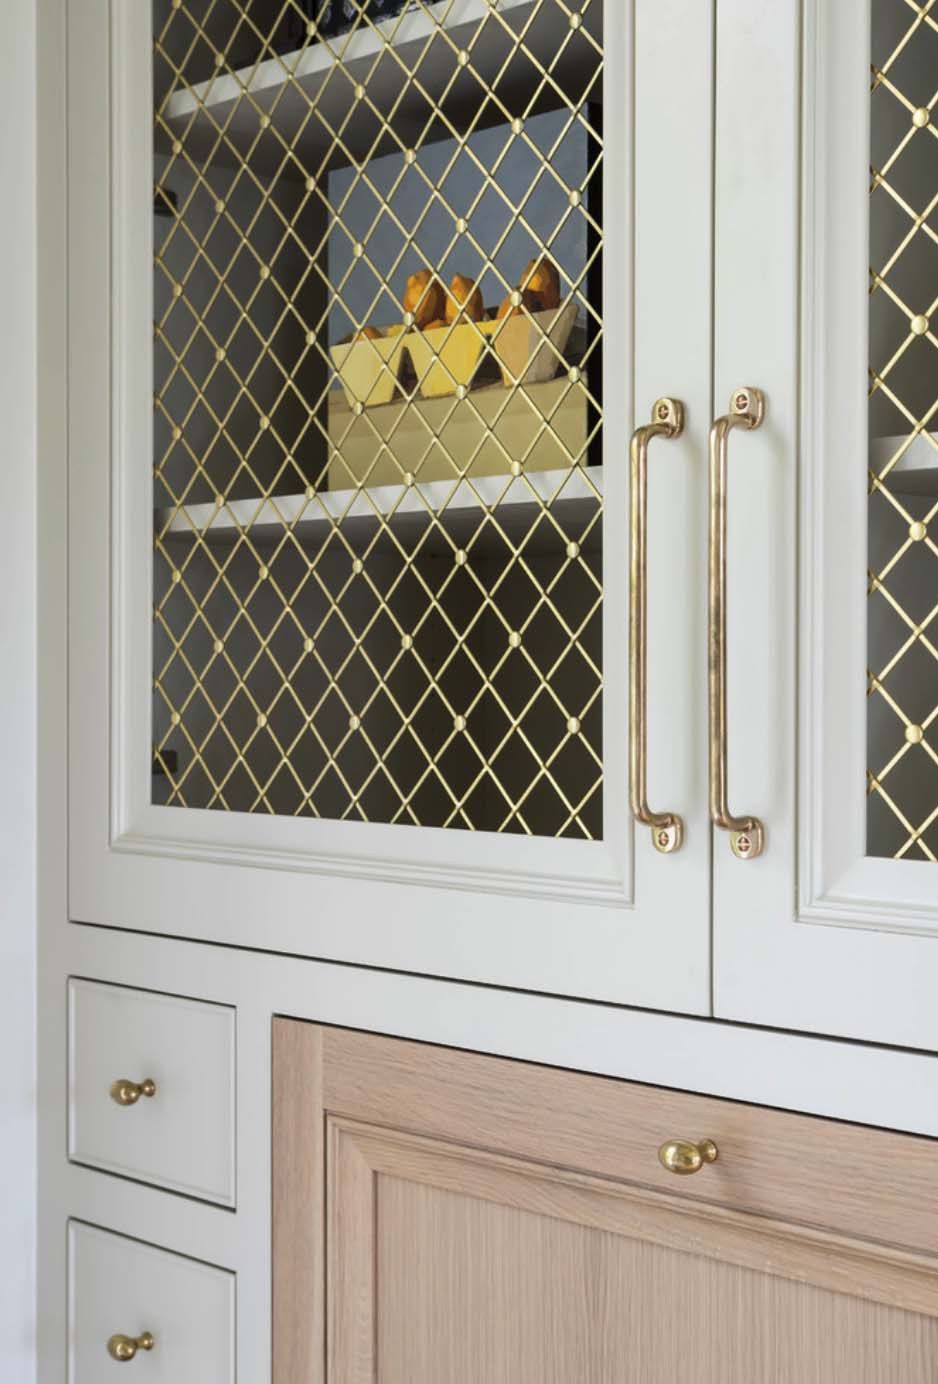 Trend To Try Wire Mesh Cabinets Greystone Statement Interiors Interior Design Blog Armoire Bureau Idees Pour La Maison Maison